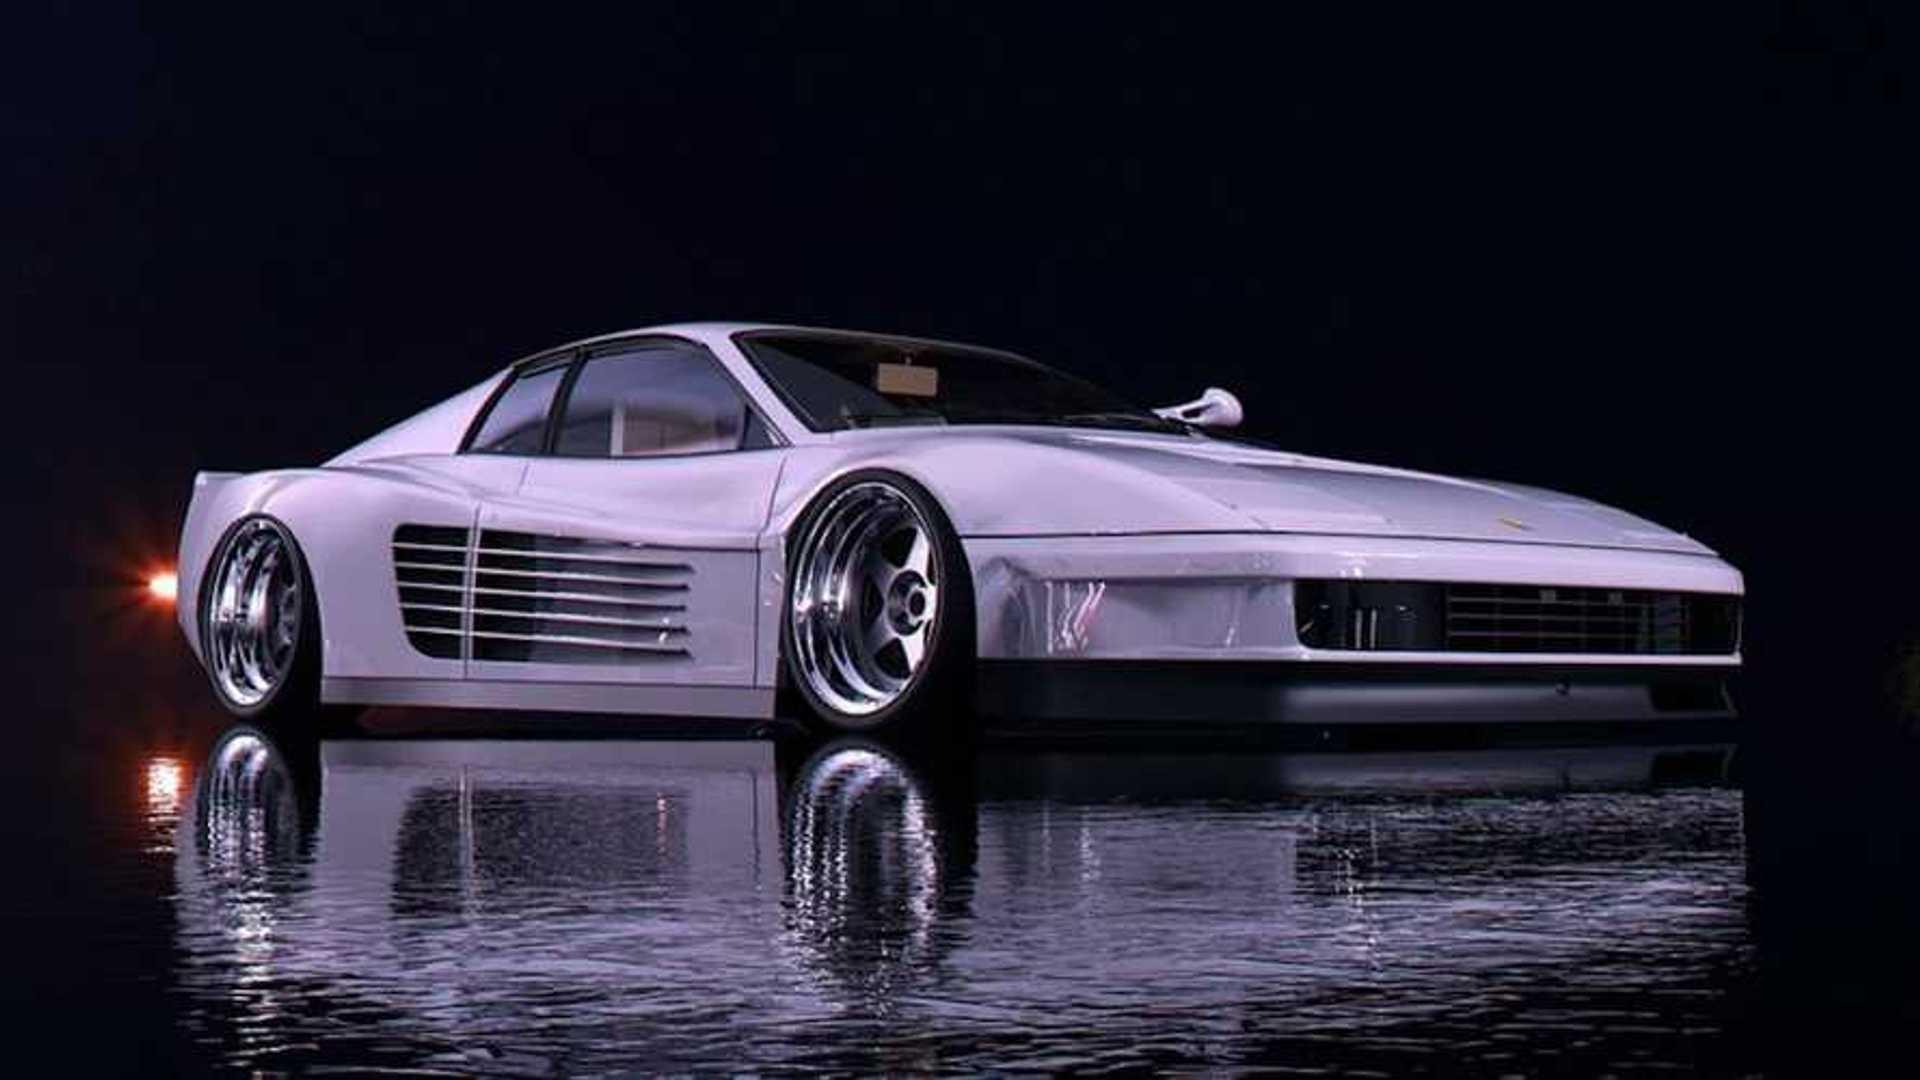 This Ferrari Testarossa Miami Vice Rendering Looks Really Neat